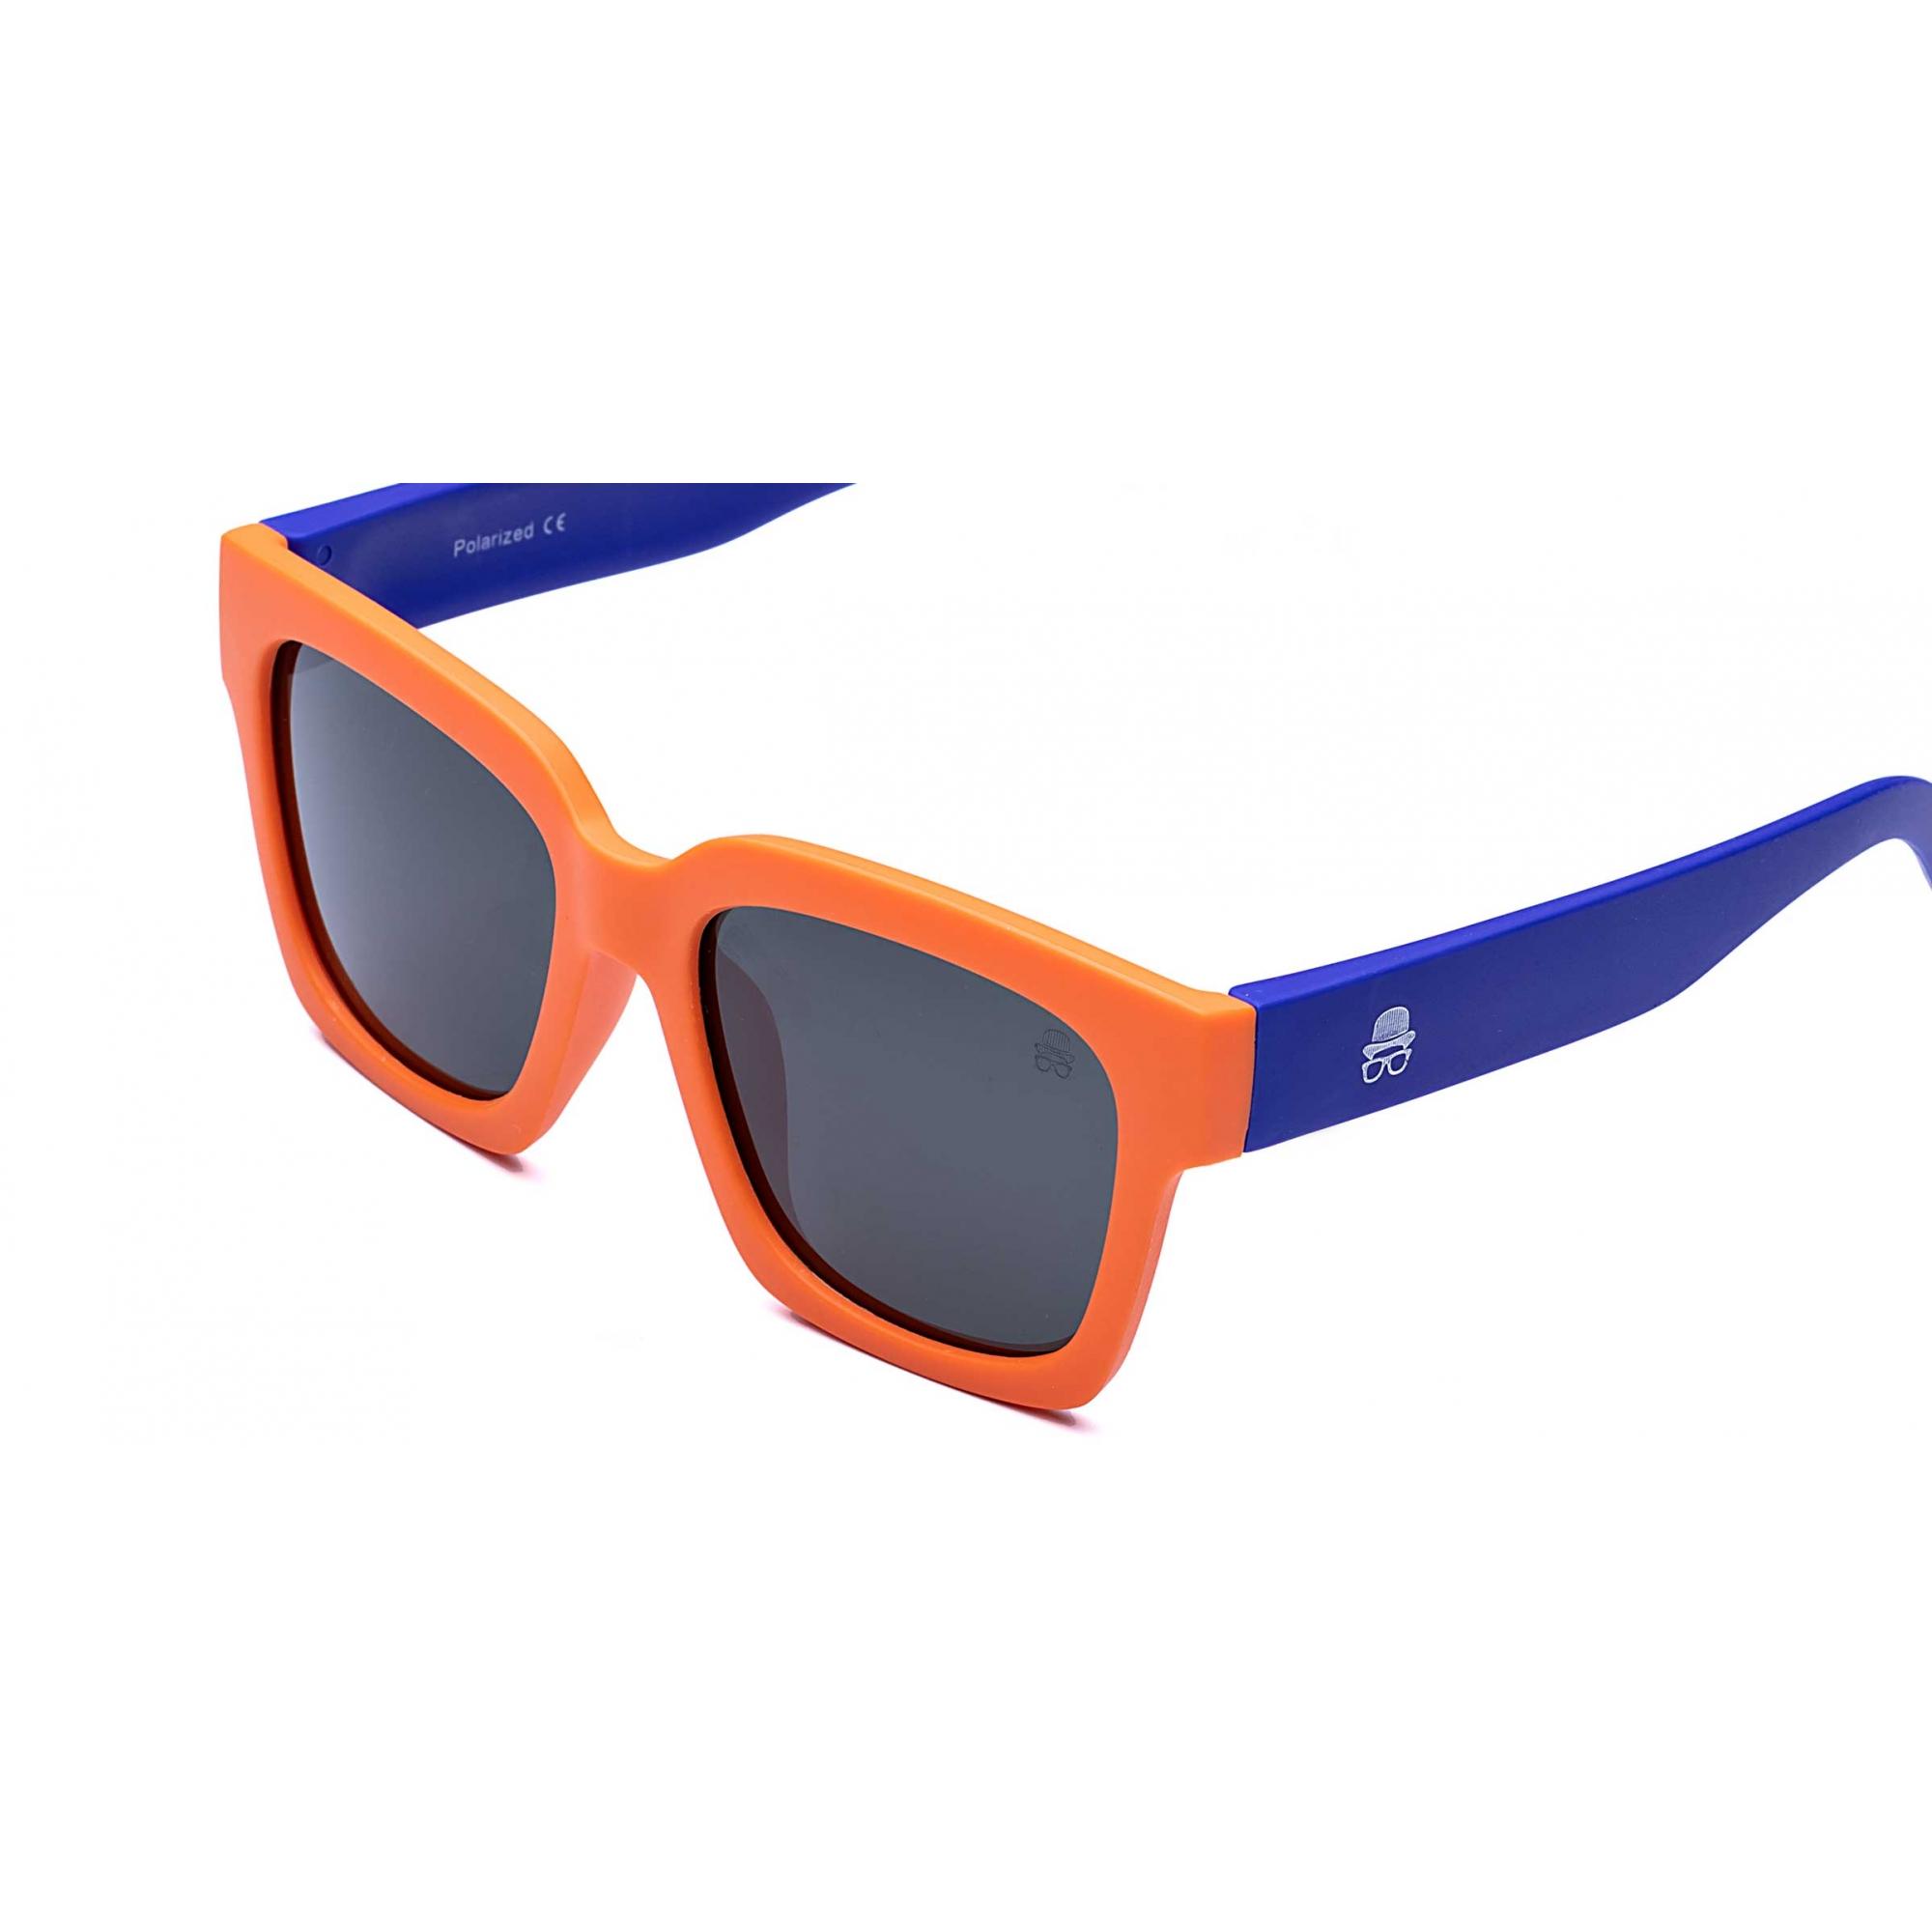 Óculos de Sol Larry Rafael Lopes